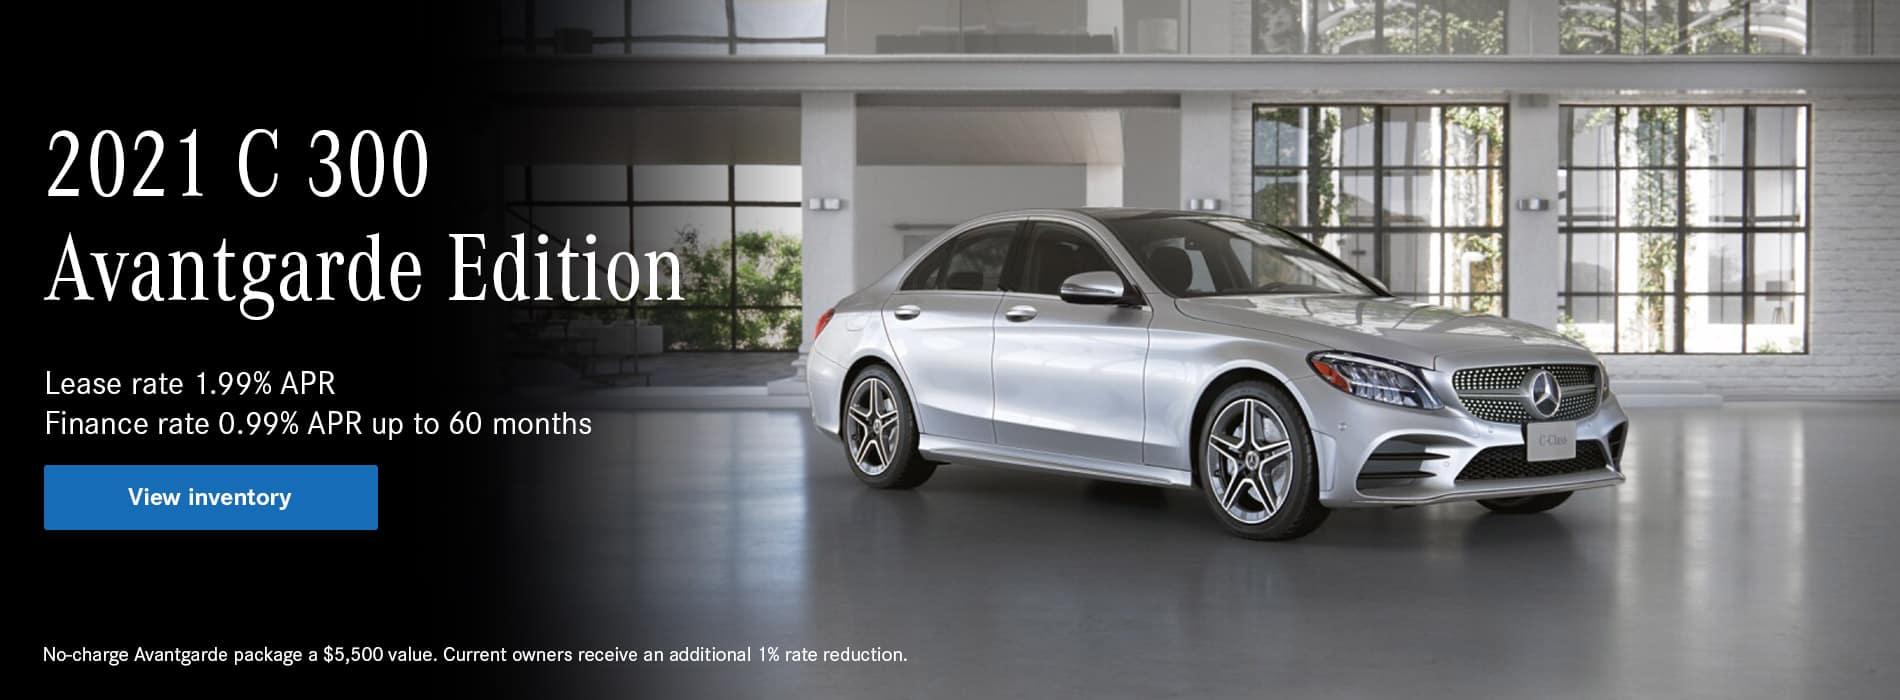 Mercedes-1900×700-Jul-C300